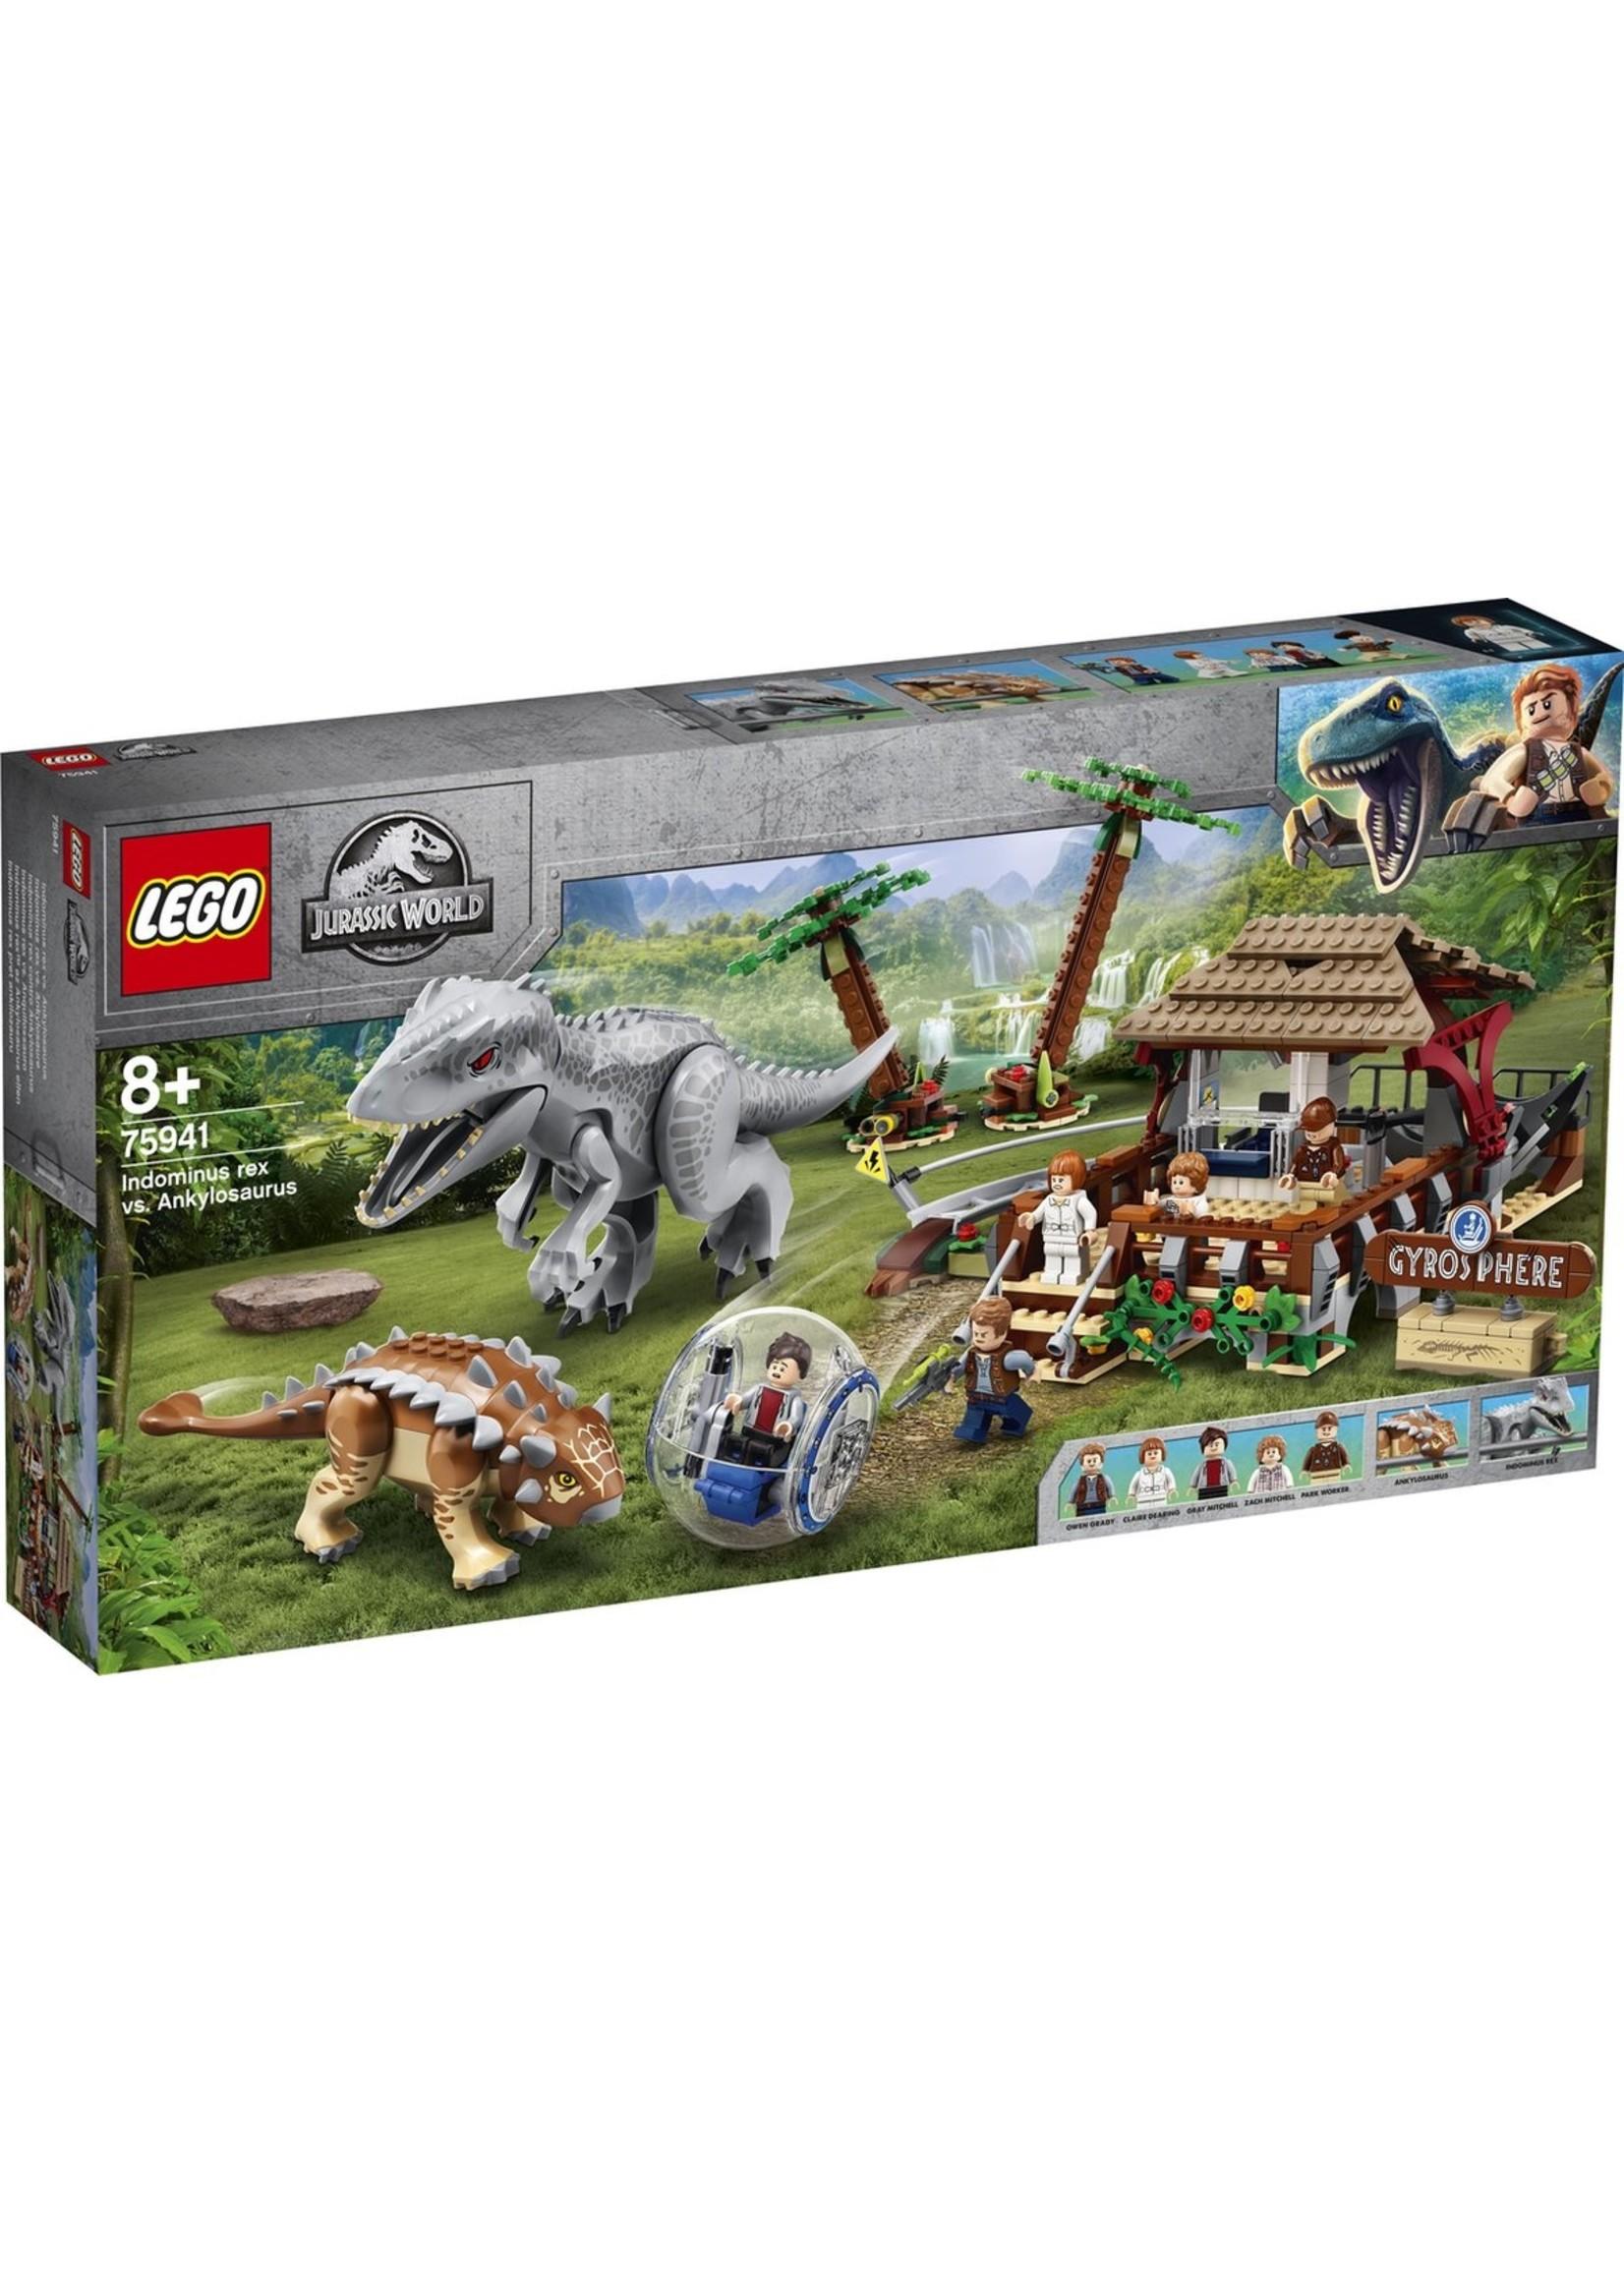 Lego LEGO Jurassic Park Indominus Rex vs. Ankylosaurus -75941